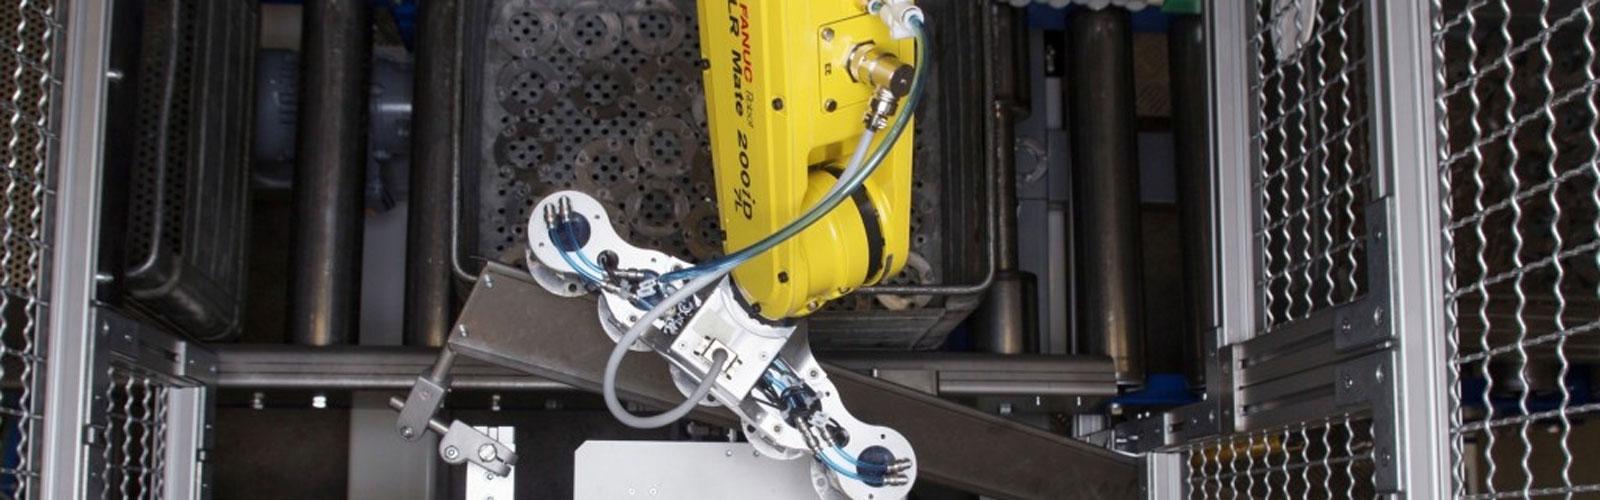 Robot technology (robotics) and automation